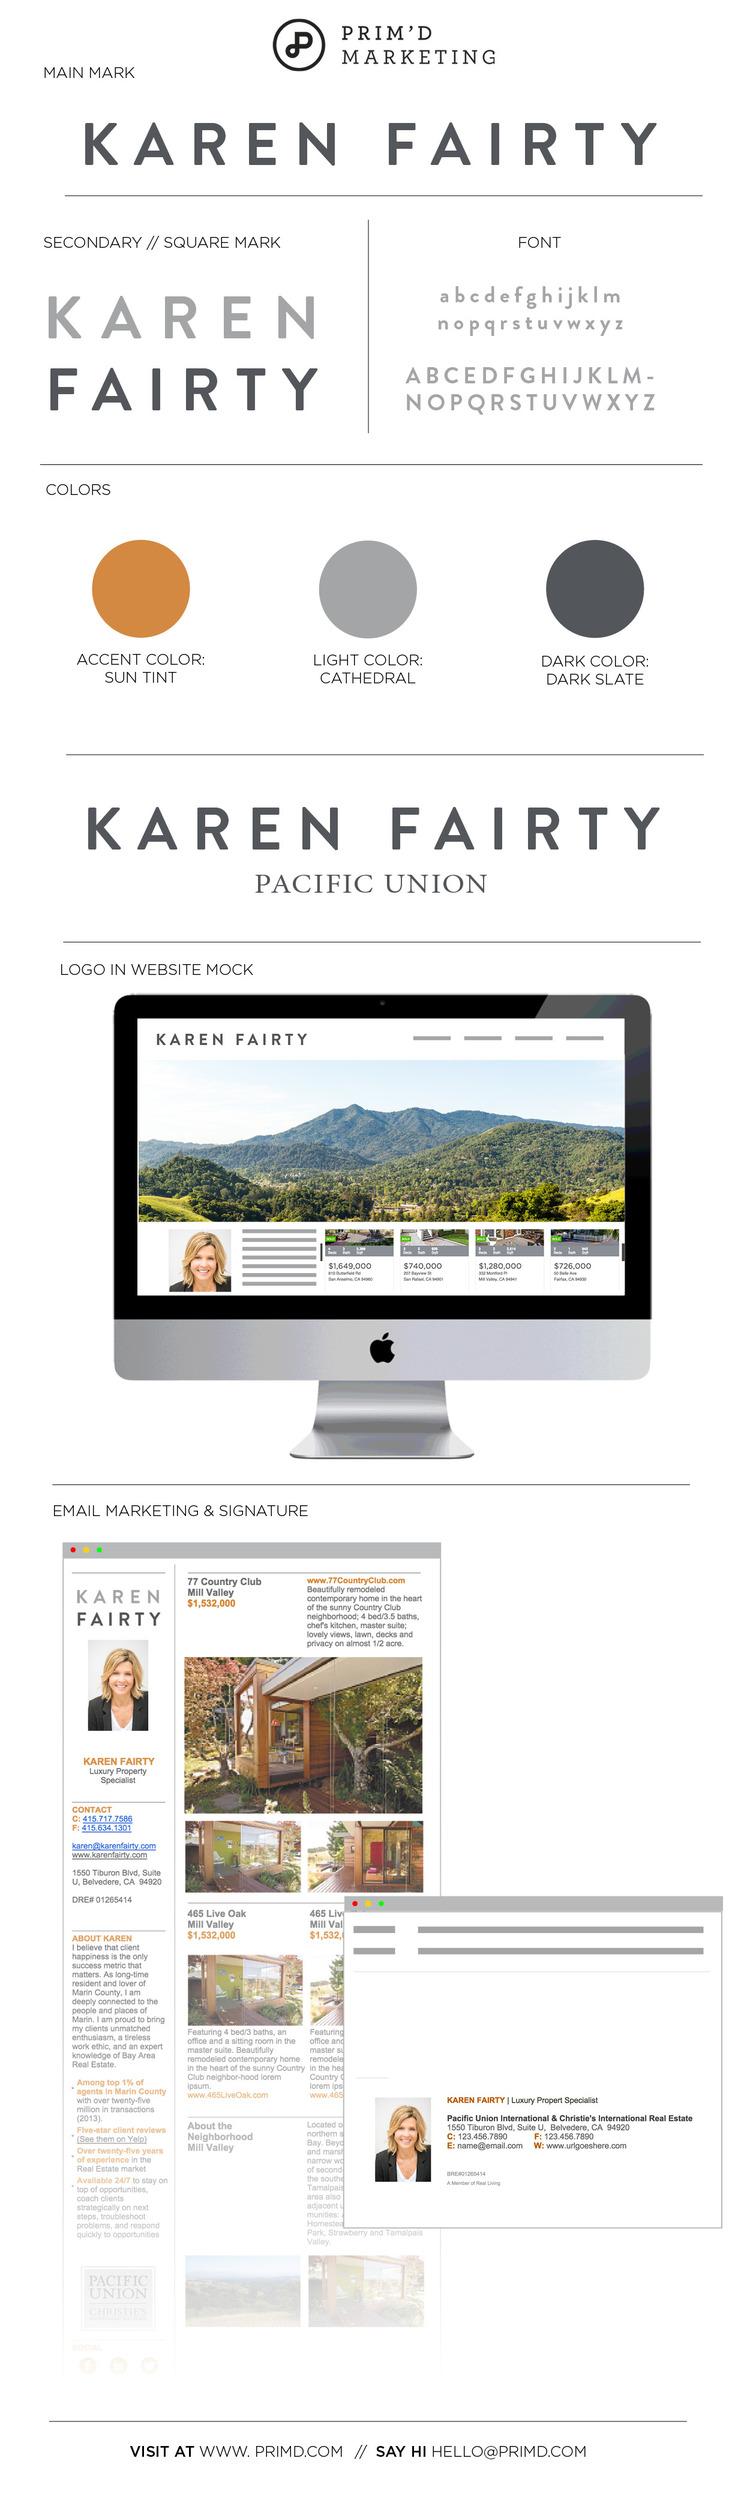 Karen Fairty logo and brand identify - Prim'd Marketing blog